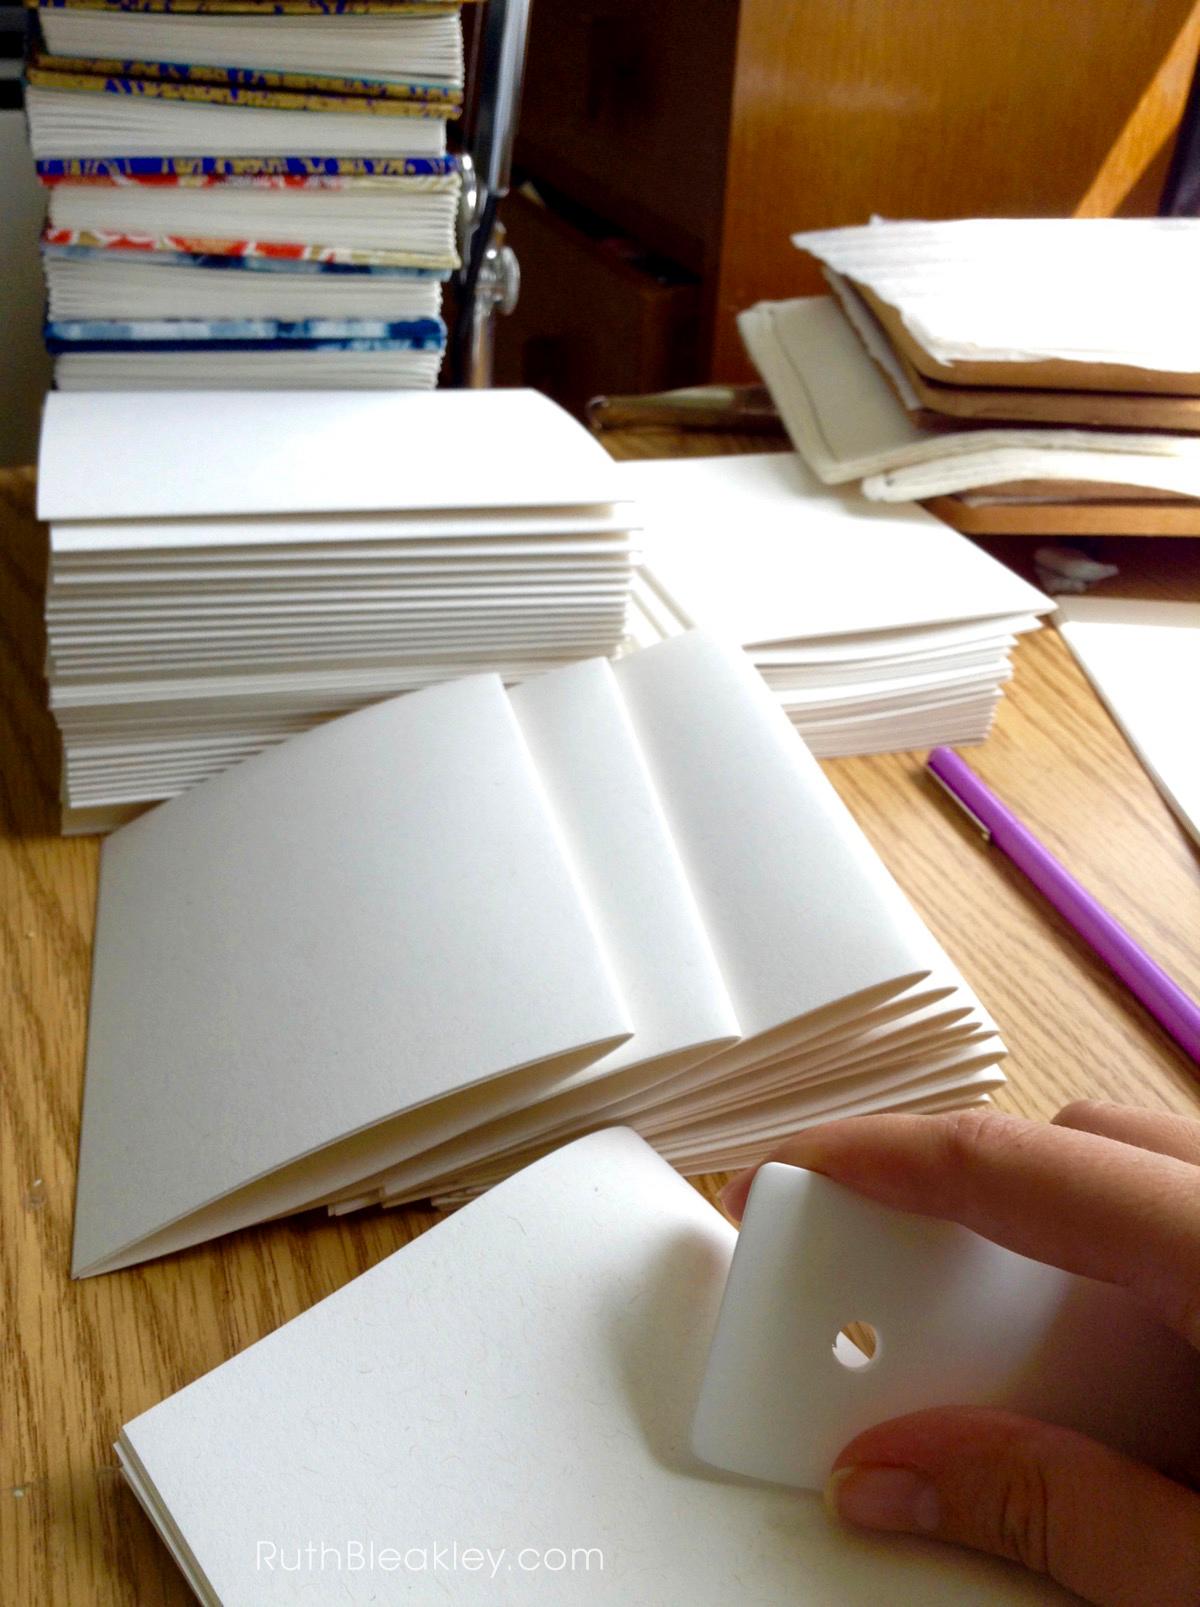 Teflon Folders vs Bone Folders - 2